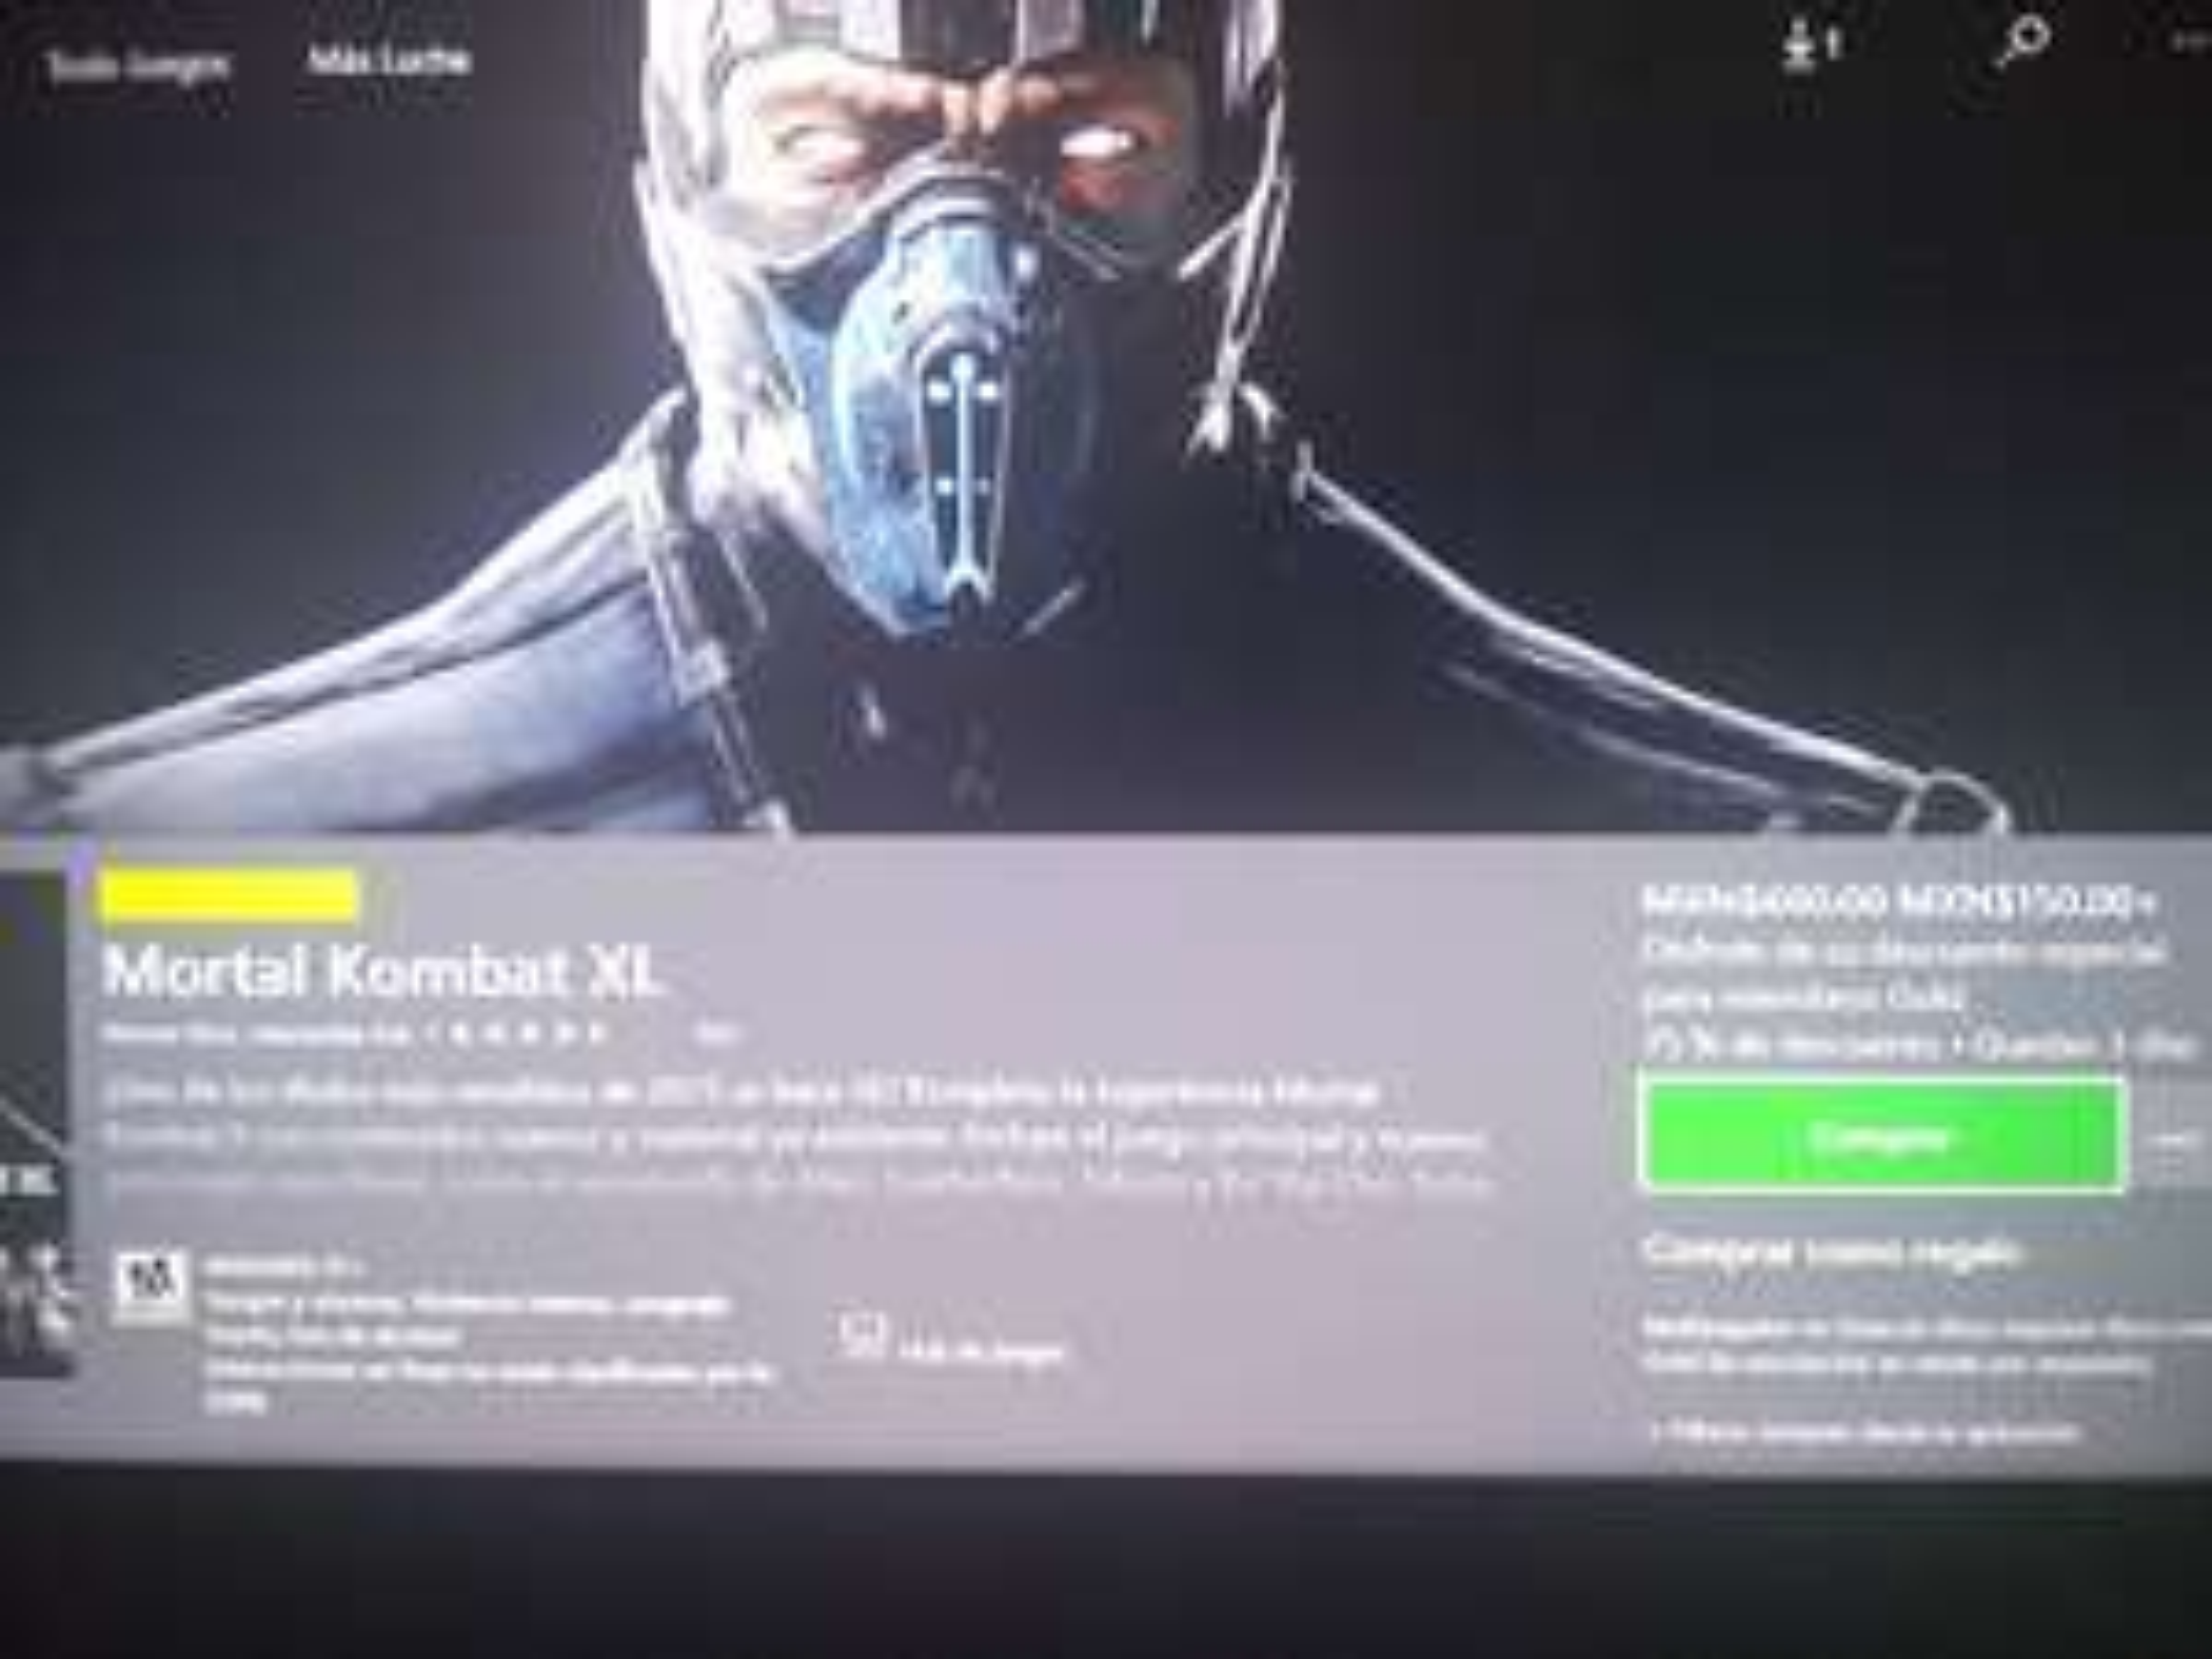 Microsoft Store: Mortal kombat XL